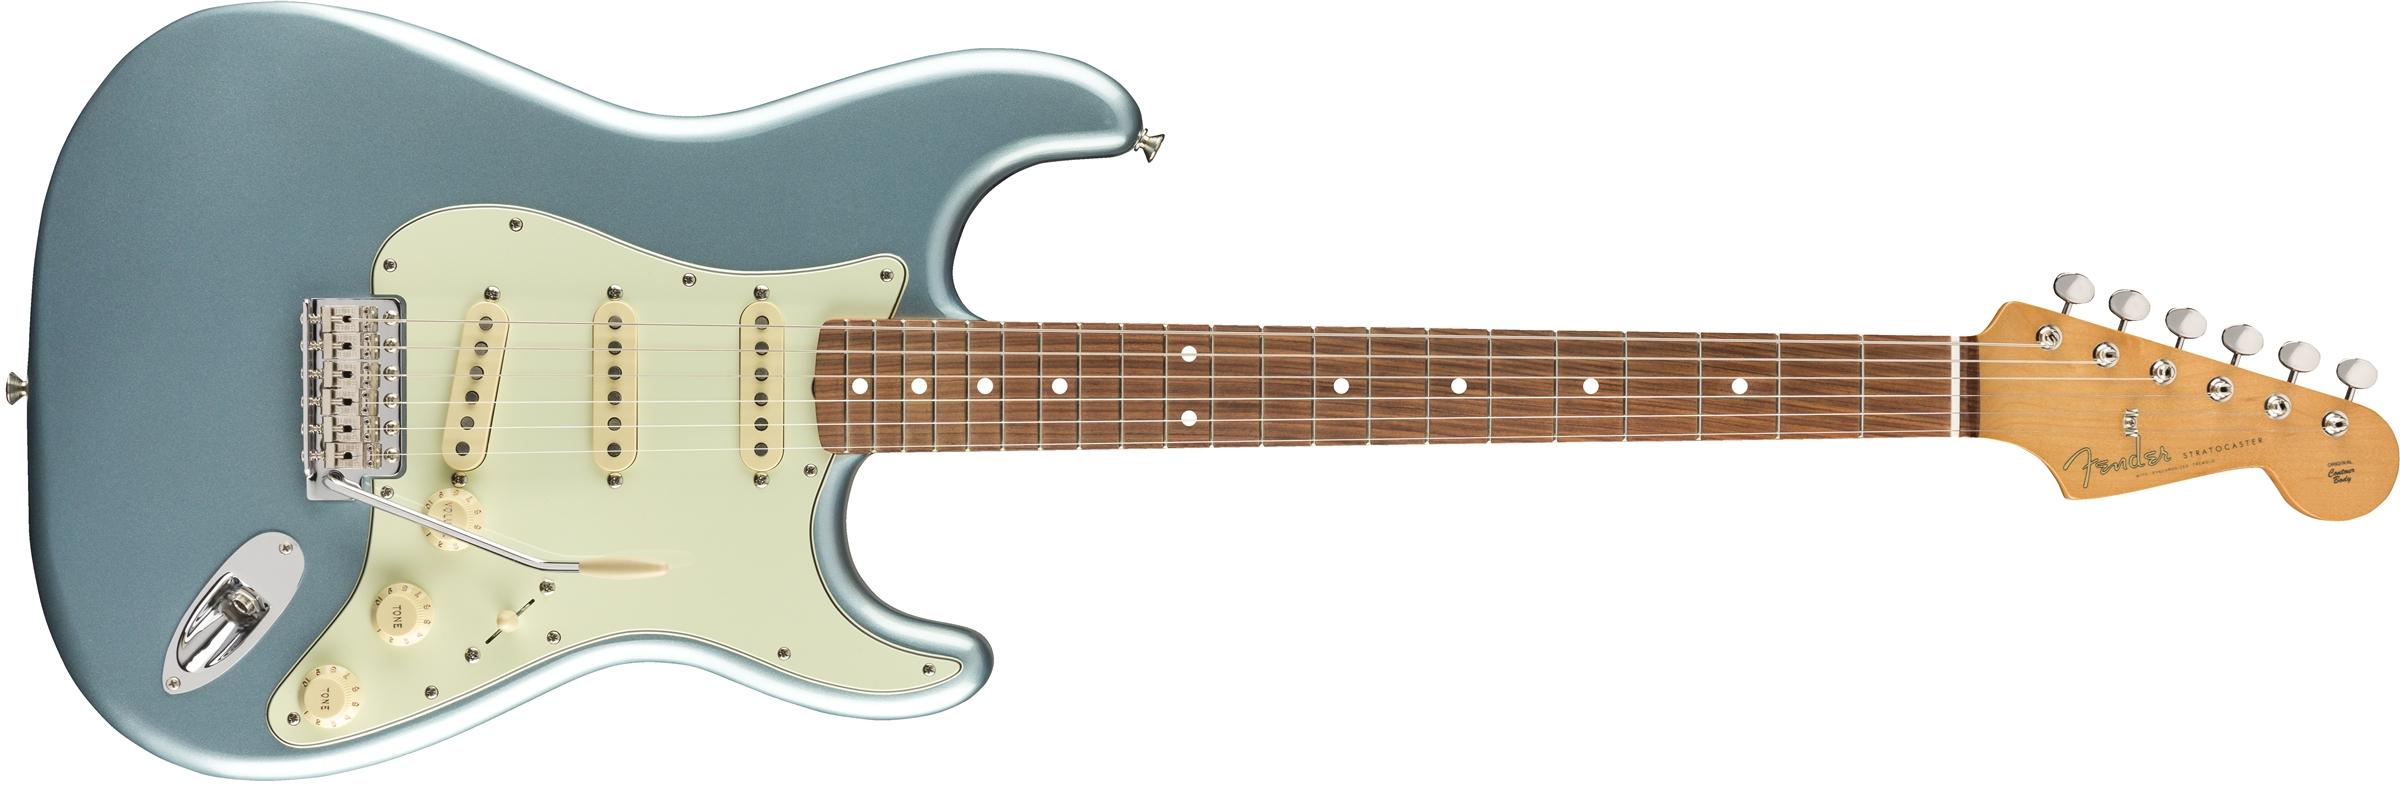 FENDER-Vintera-60s-Stratocaster-PF-Ice-Blue-Metallic-0149983383-sku-23468